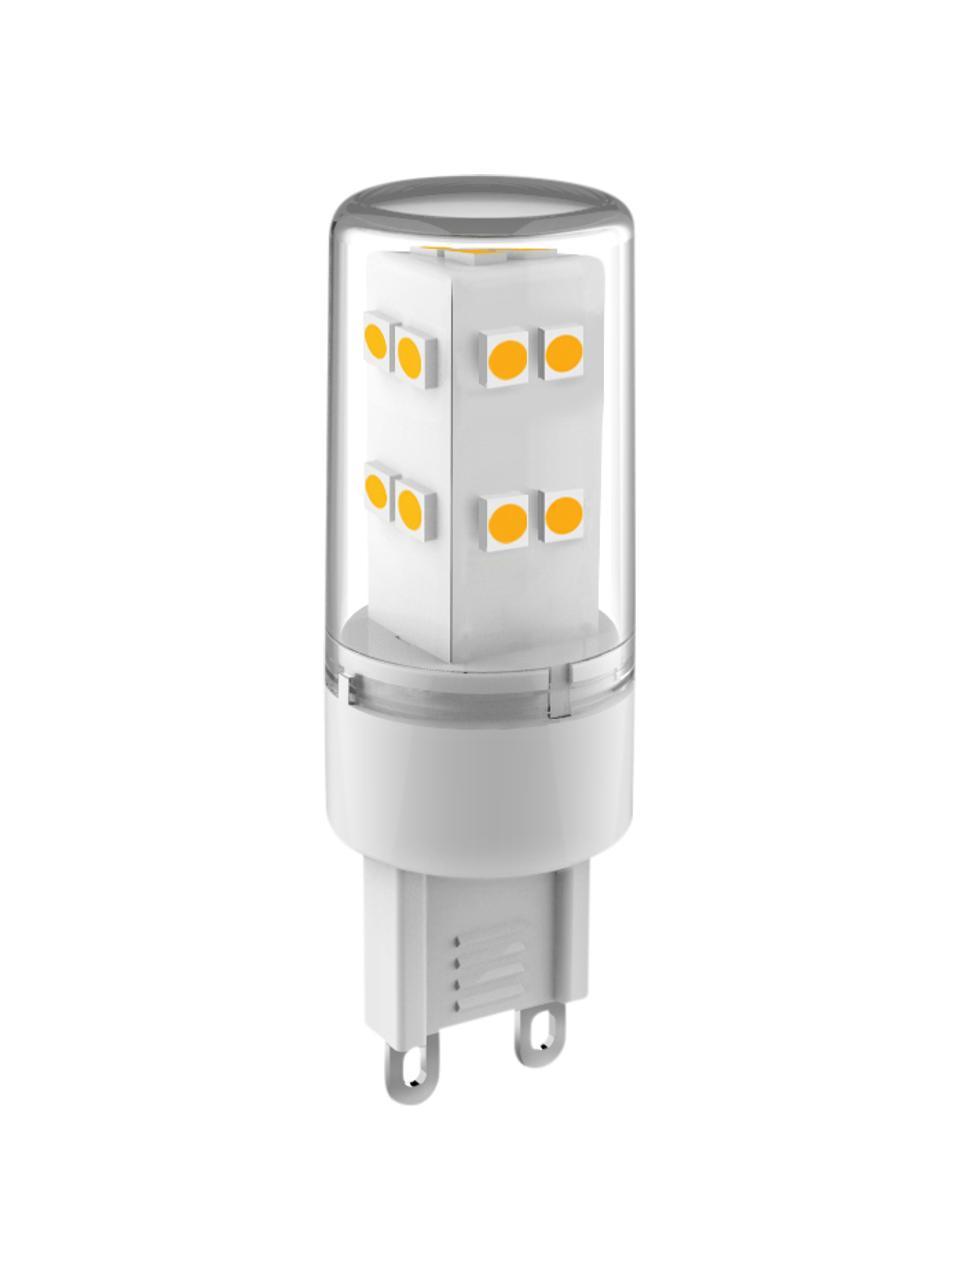 Lampadina G9, 400lm, bianco neutro, 6 pz, Paralume: vetro, Base lampadina: alluminio, Trasparente, Ø 2 x Alt. 6 cm